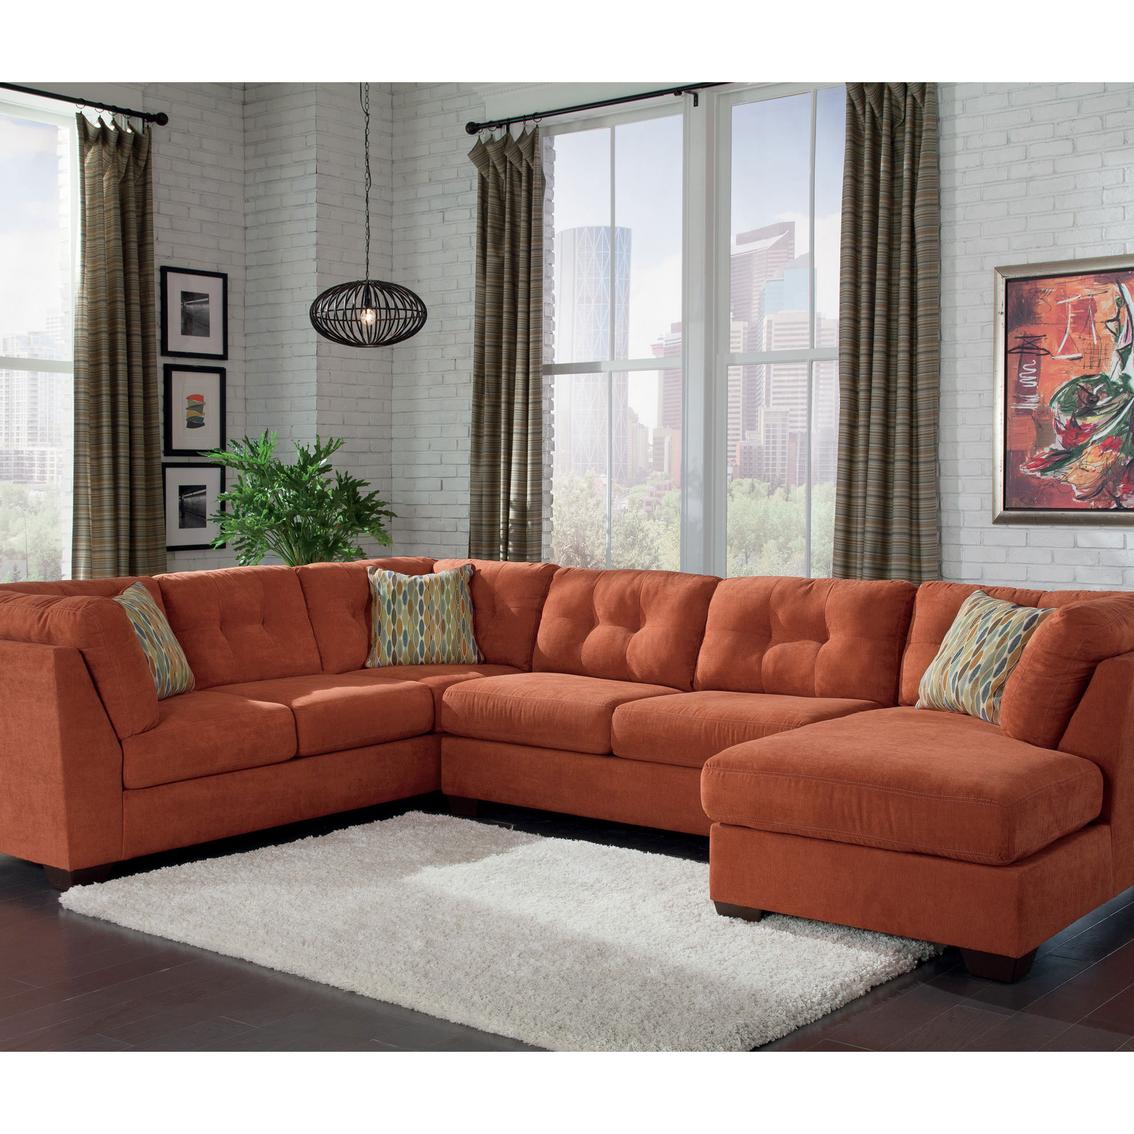 18 Cigar Lounge Furniture De Grote Manners Mancave